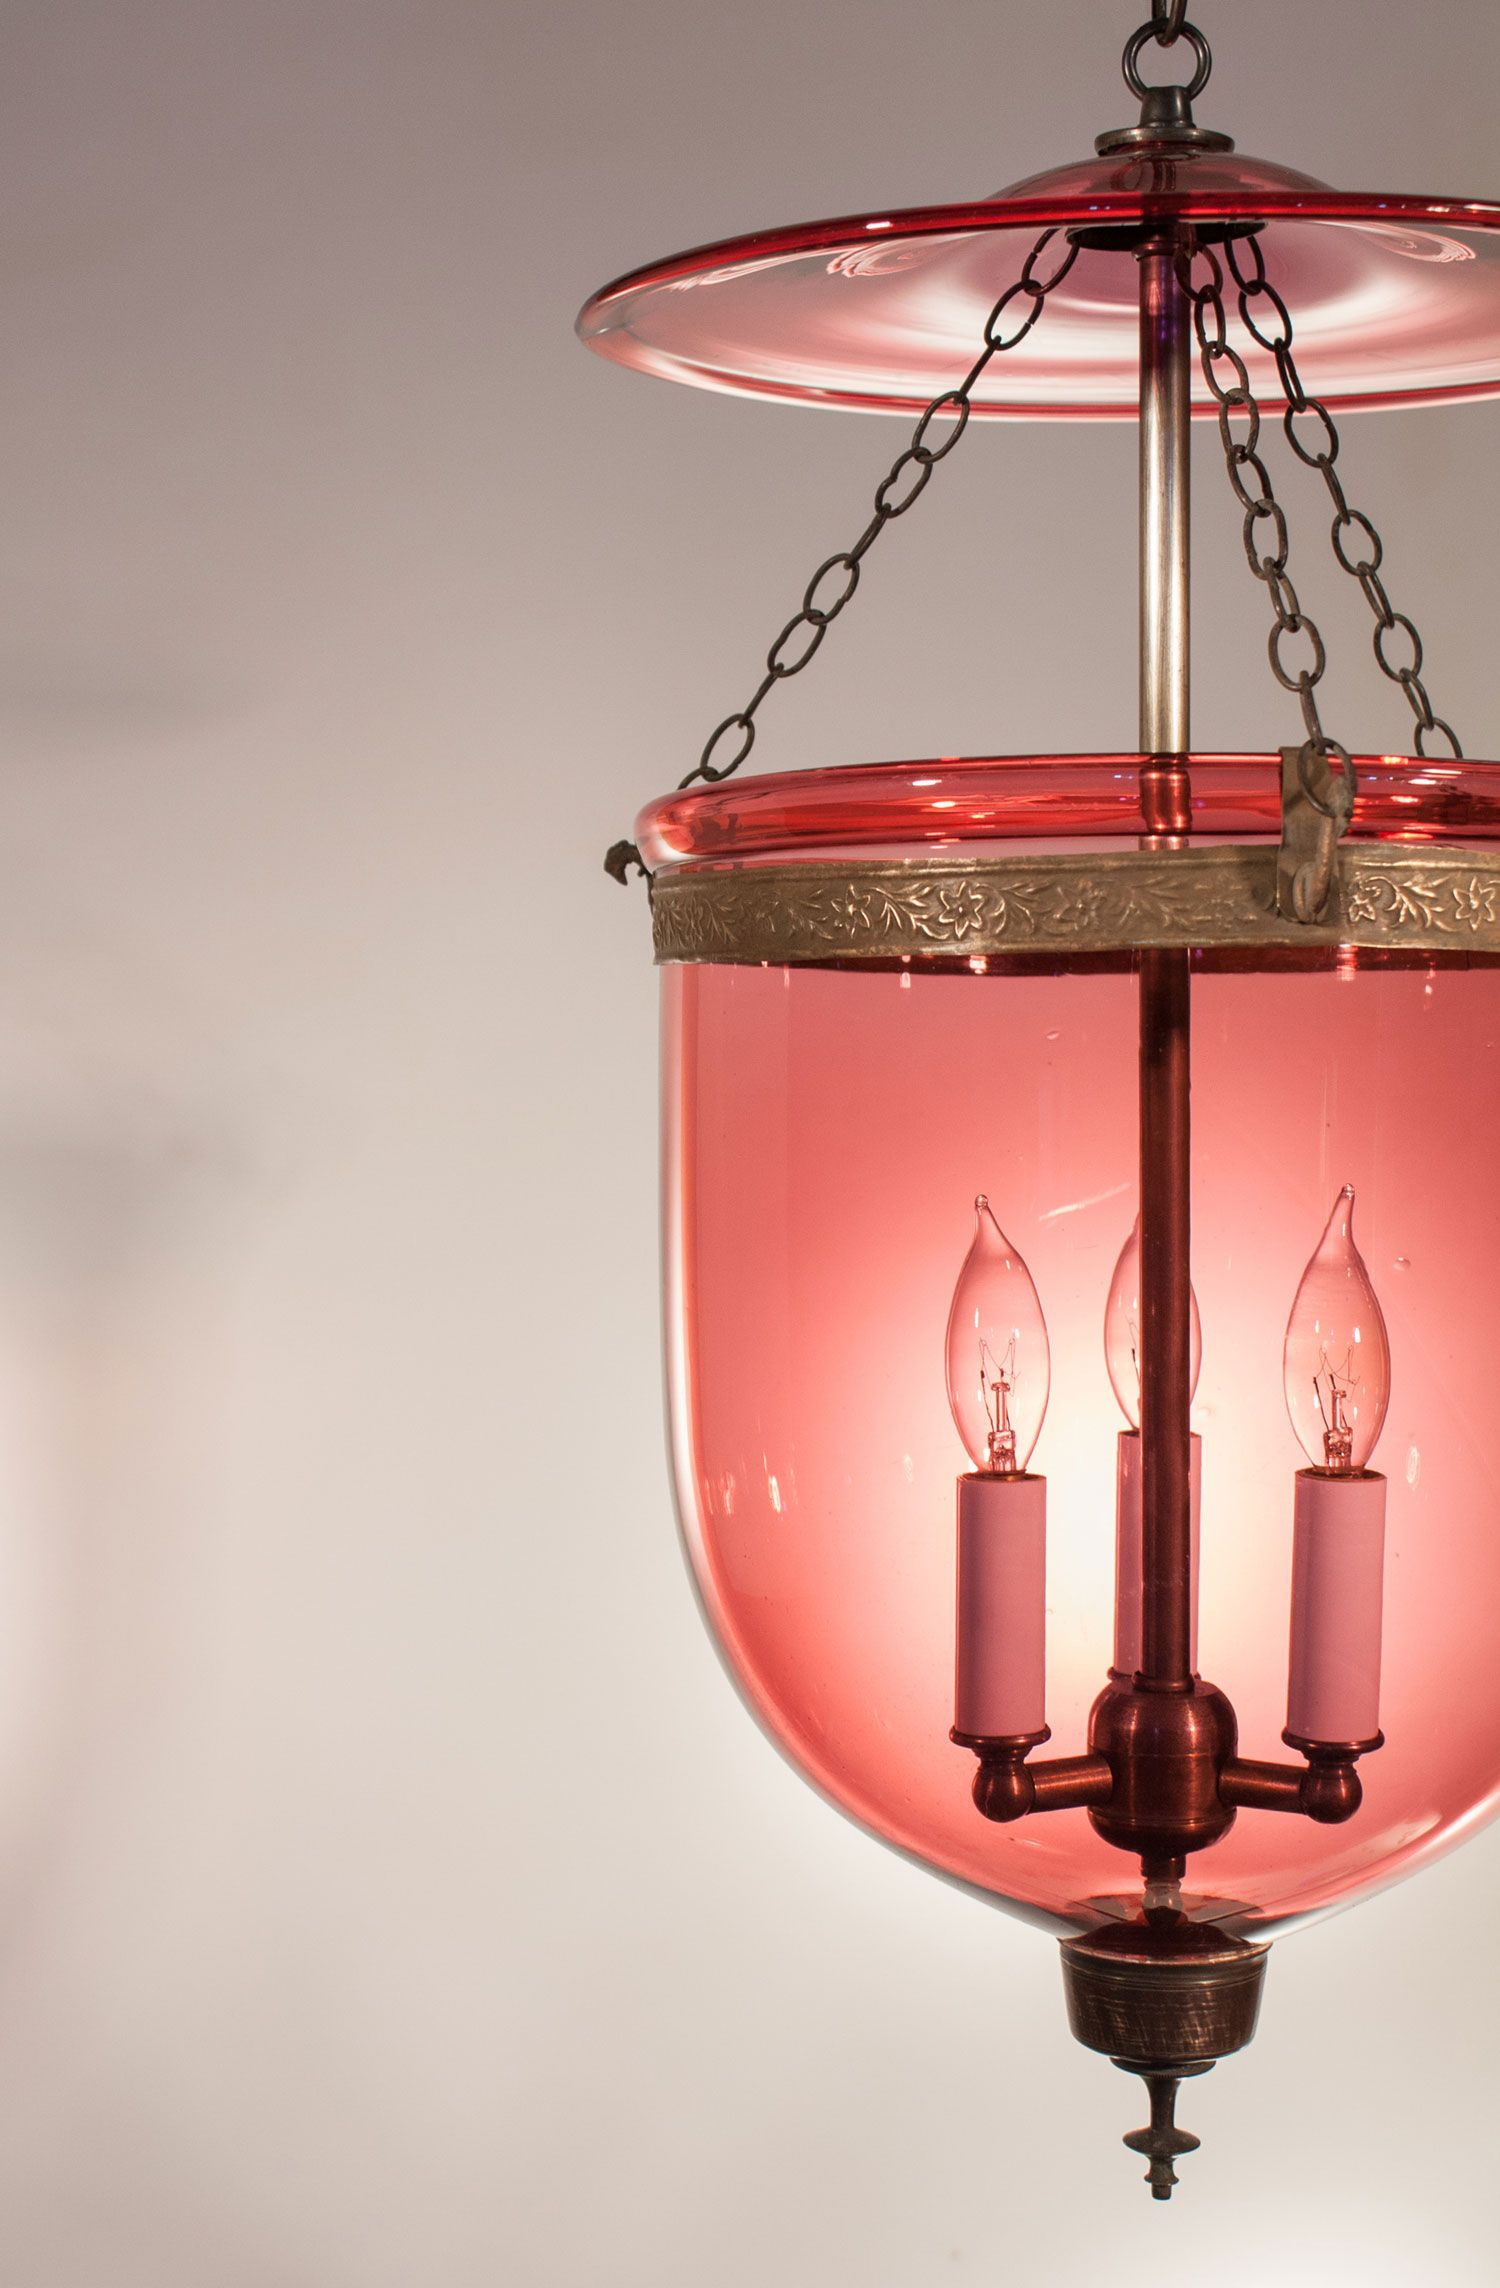 Antique Cranberry Colored Handblown Glass Bell Jar Lantern